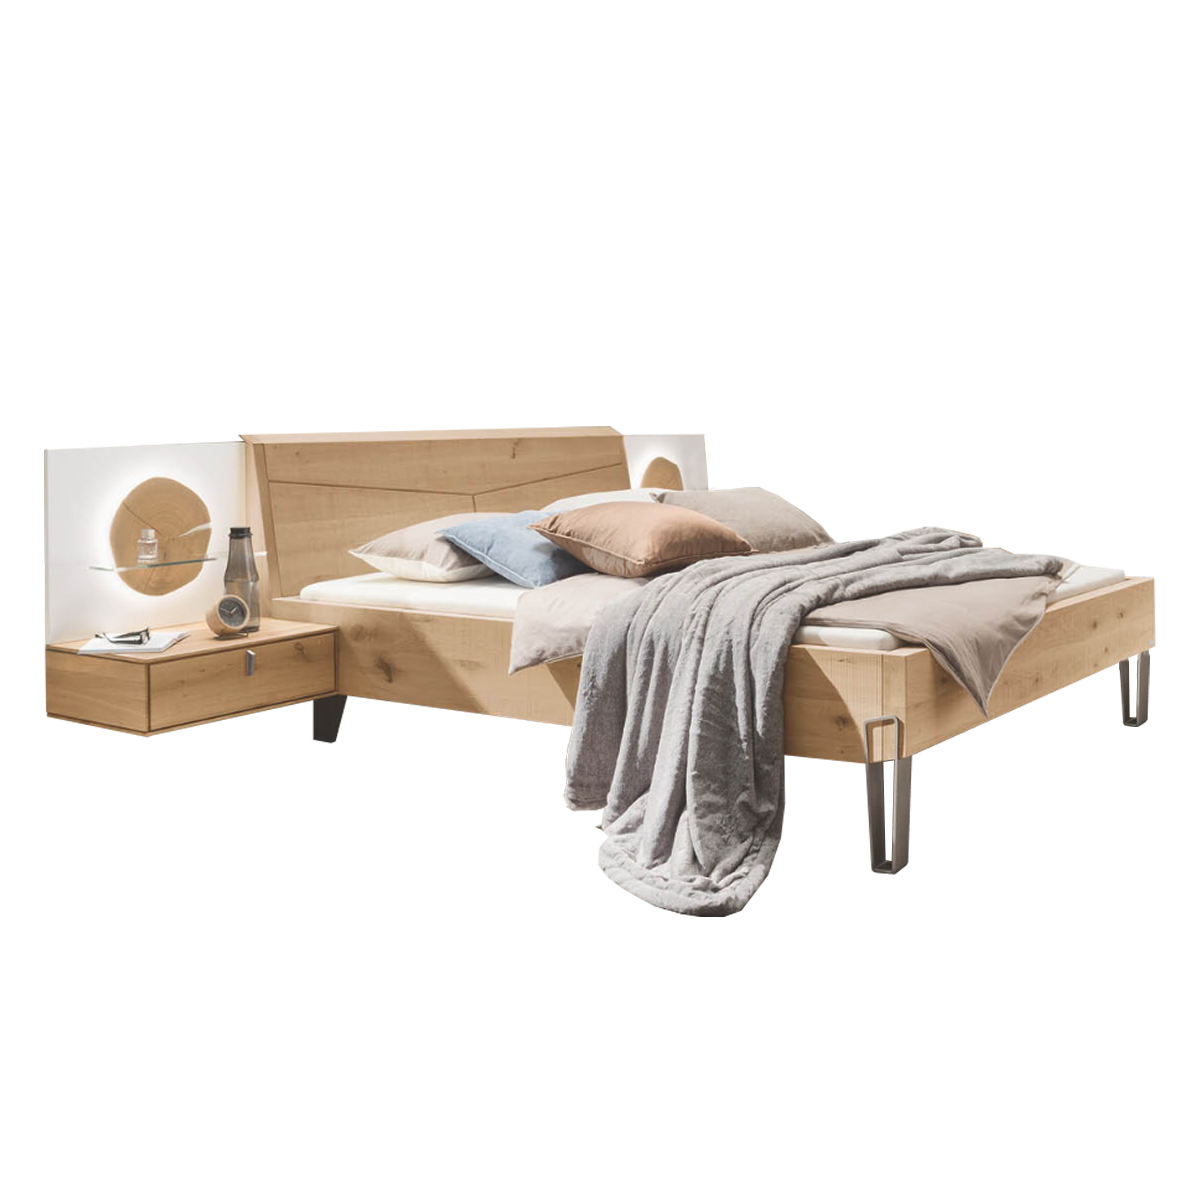 Full Size of Bett Holz Thielemeyer Meta Bettanlage Mit Massivholz In Einem Sgeschnitt Design 180x200 Komplett Lattenrost Und Matratze Clinique Even Better Hunde Ruf Betten Bett Bett Holz